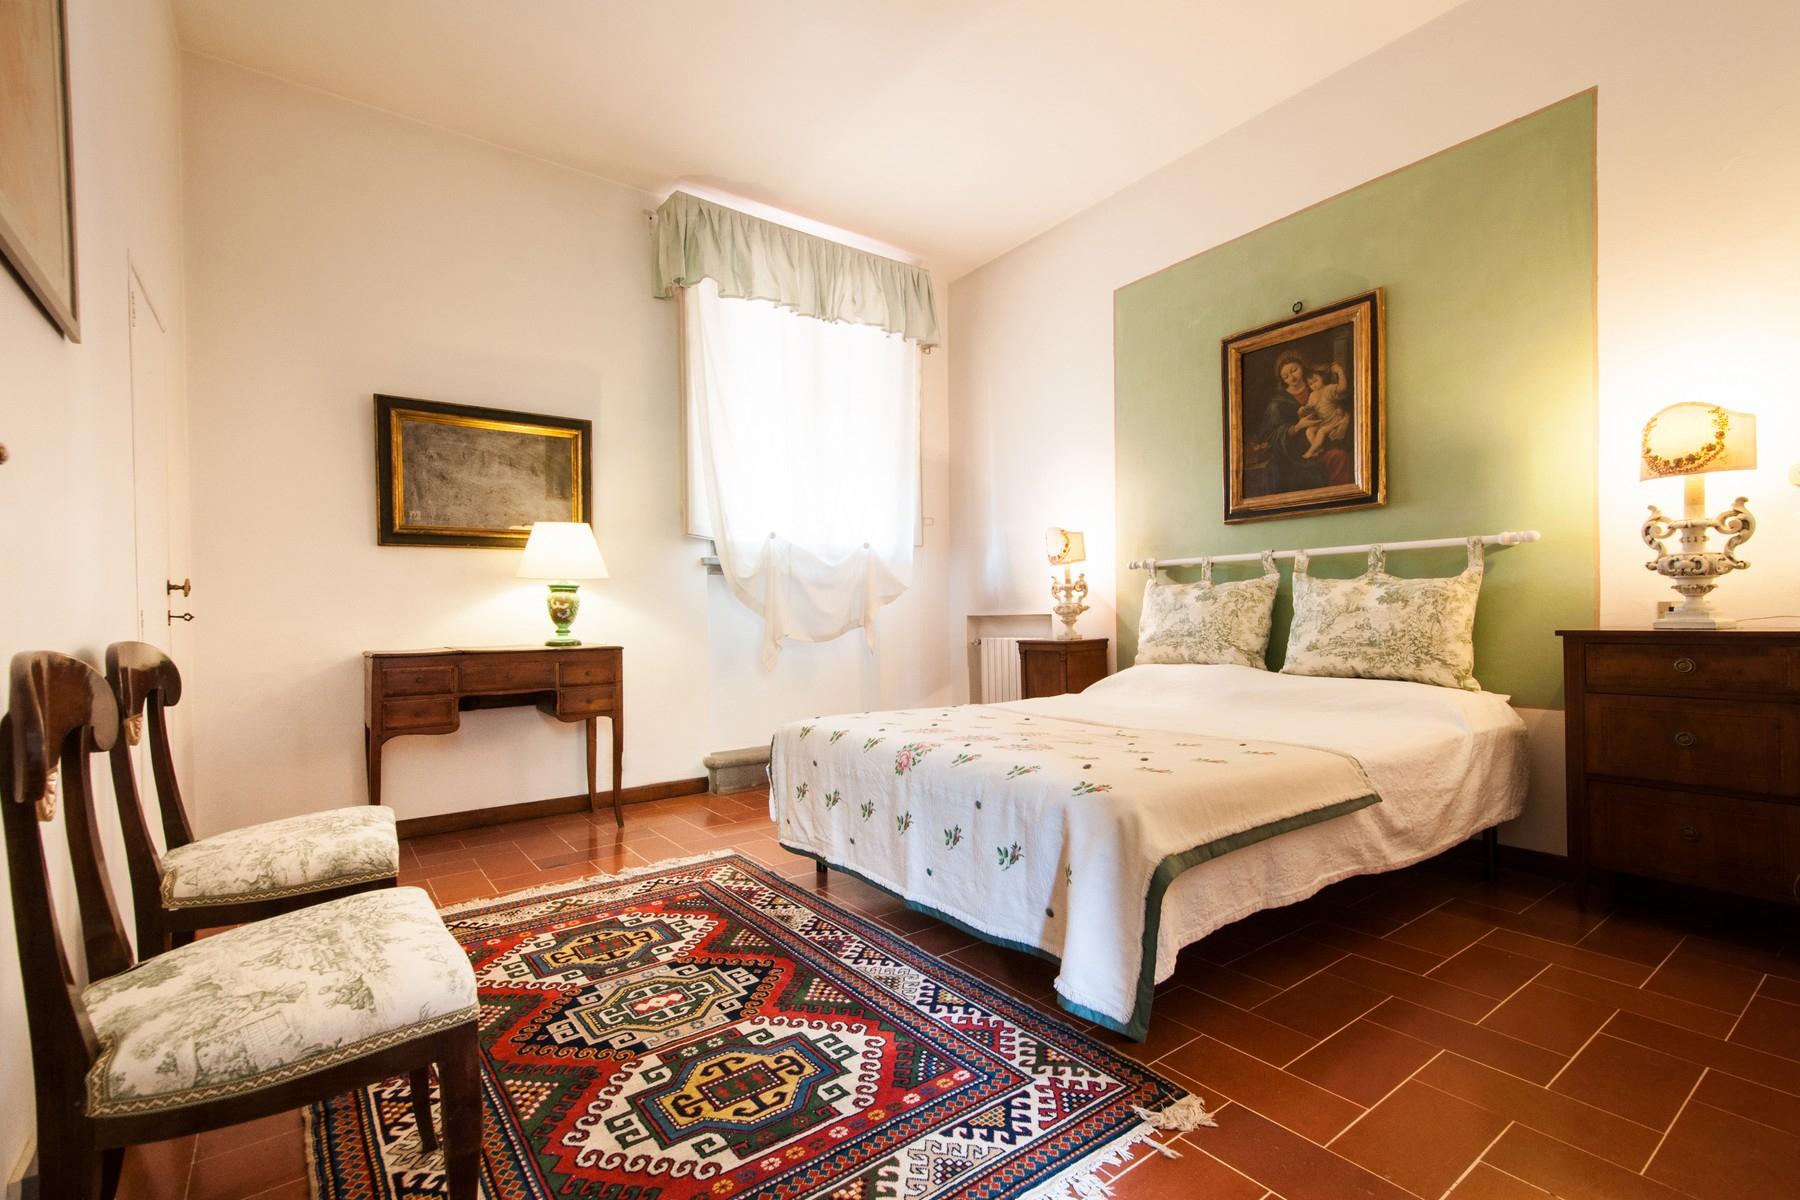 Villa in Vendita a Lucca: 5 locali, 400 mq - Foto 7